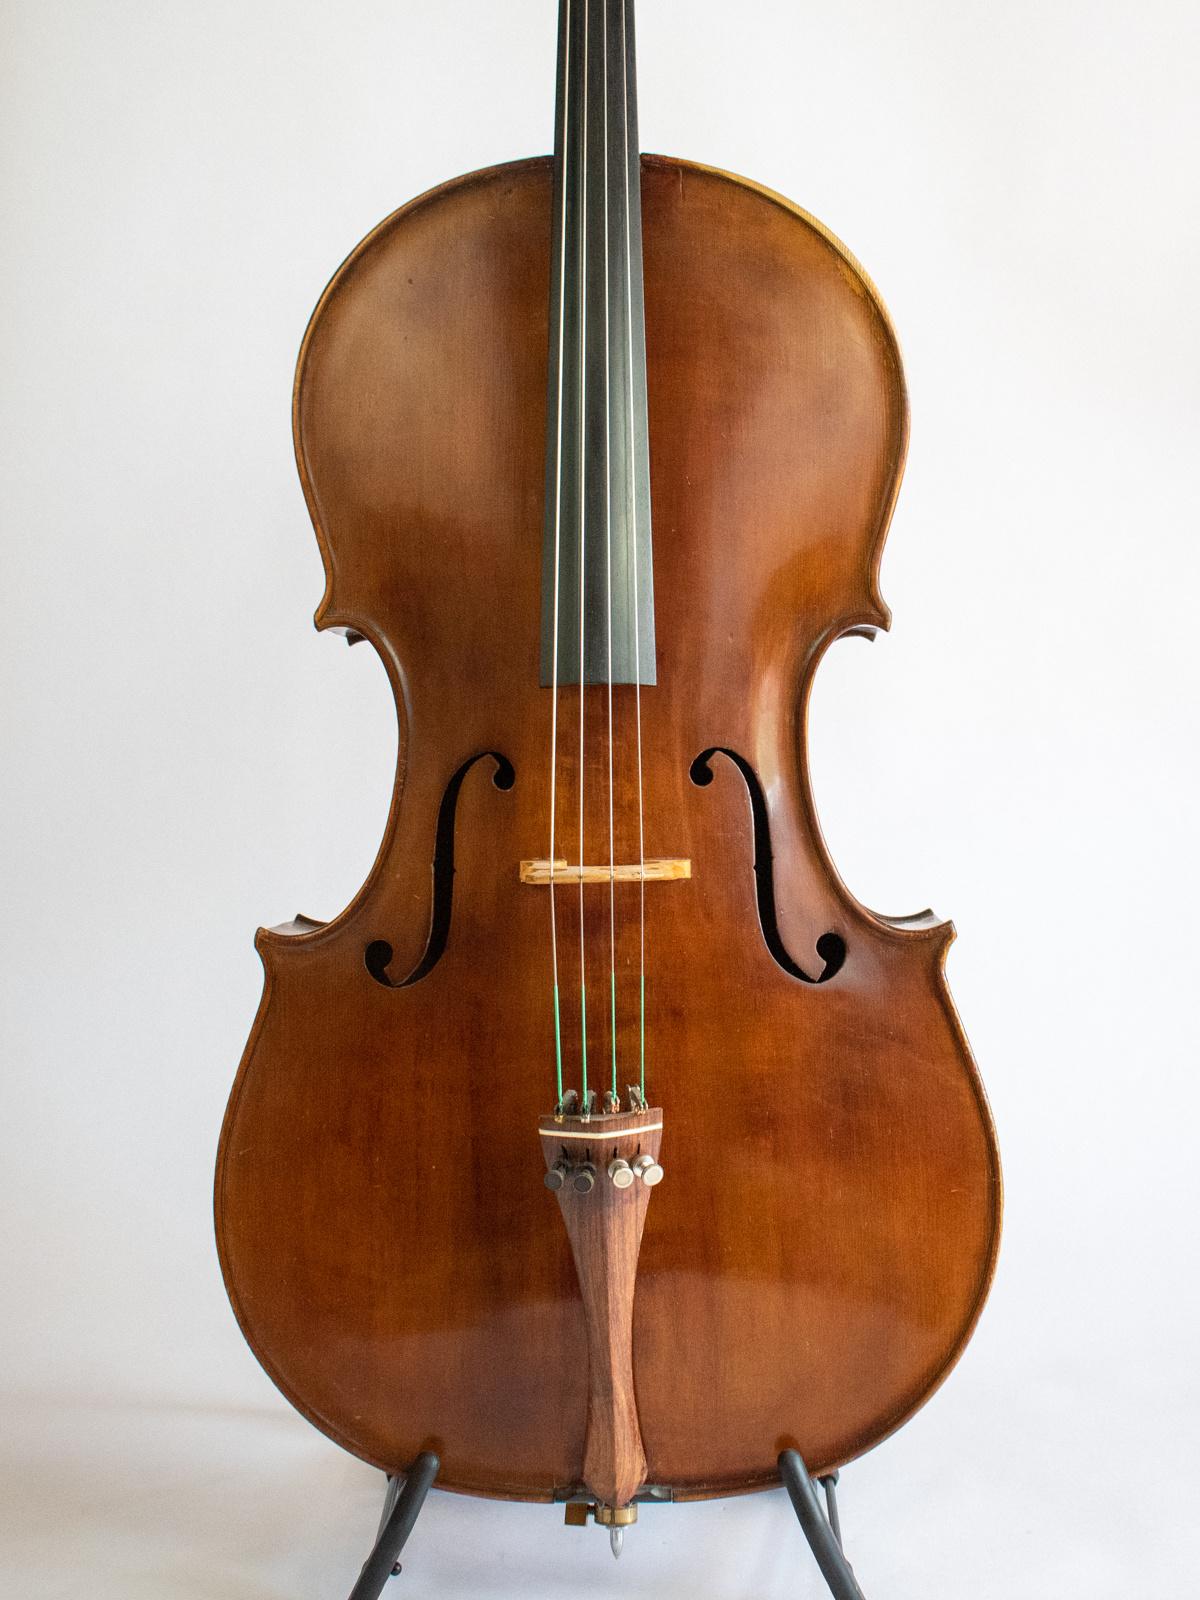 Italian Ernsto Pevere cello, 1933, Ferrara, ITALY